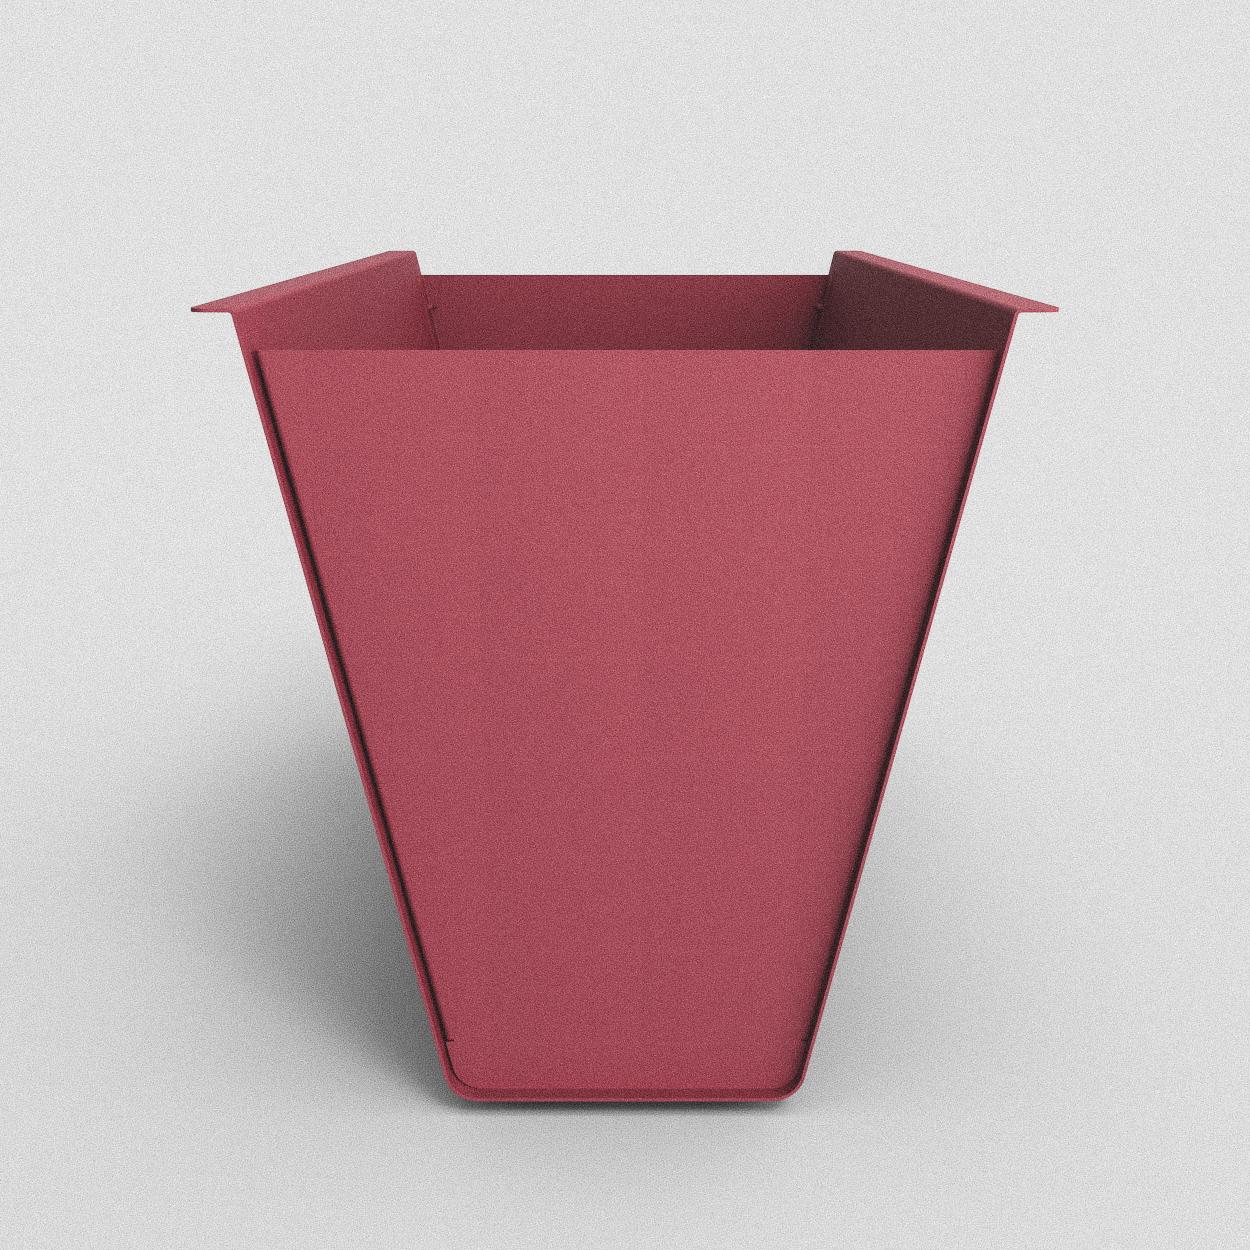 600L / Standardfärg: Lingon